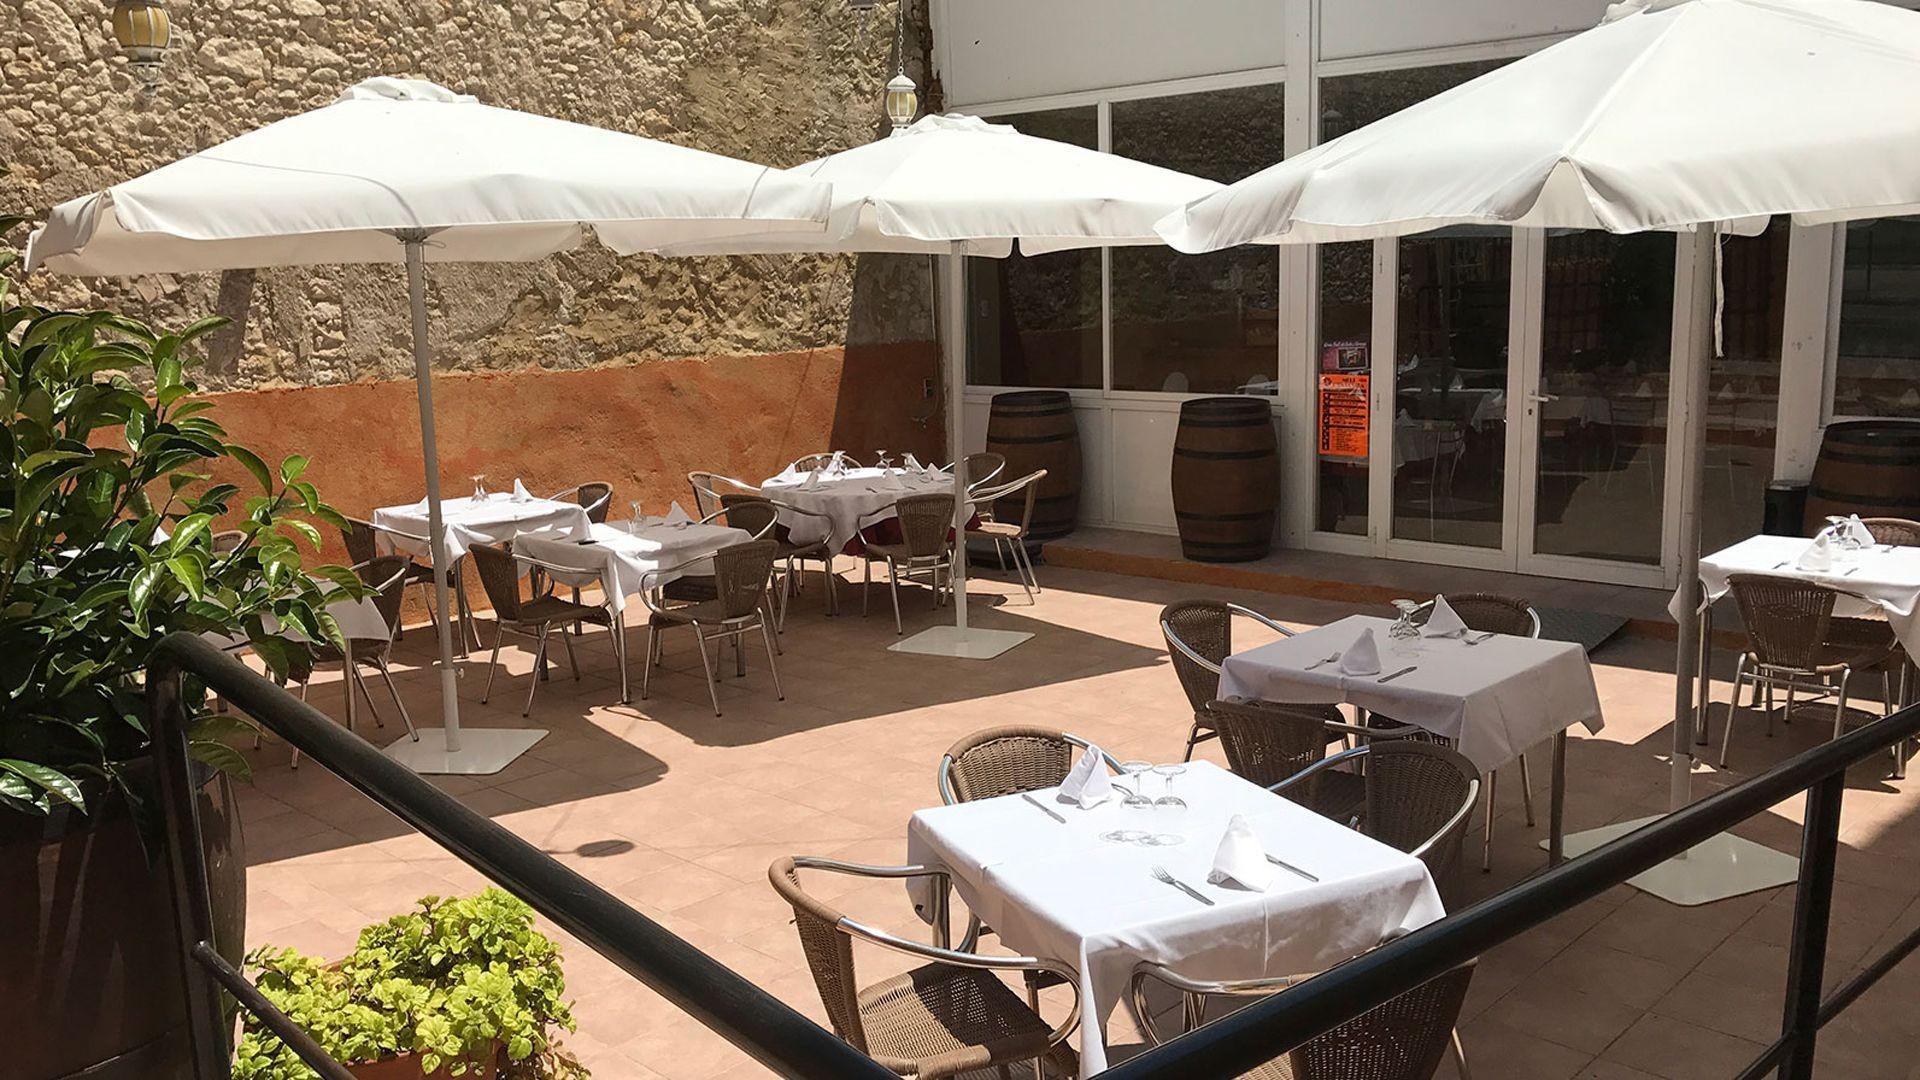 Restaurante brasseria en Vilafranca del Penedès